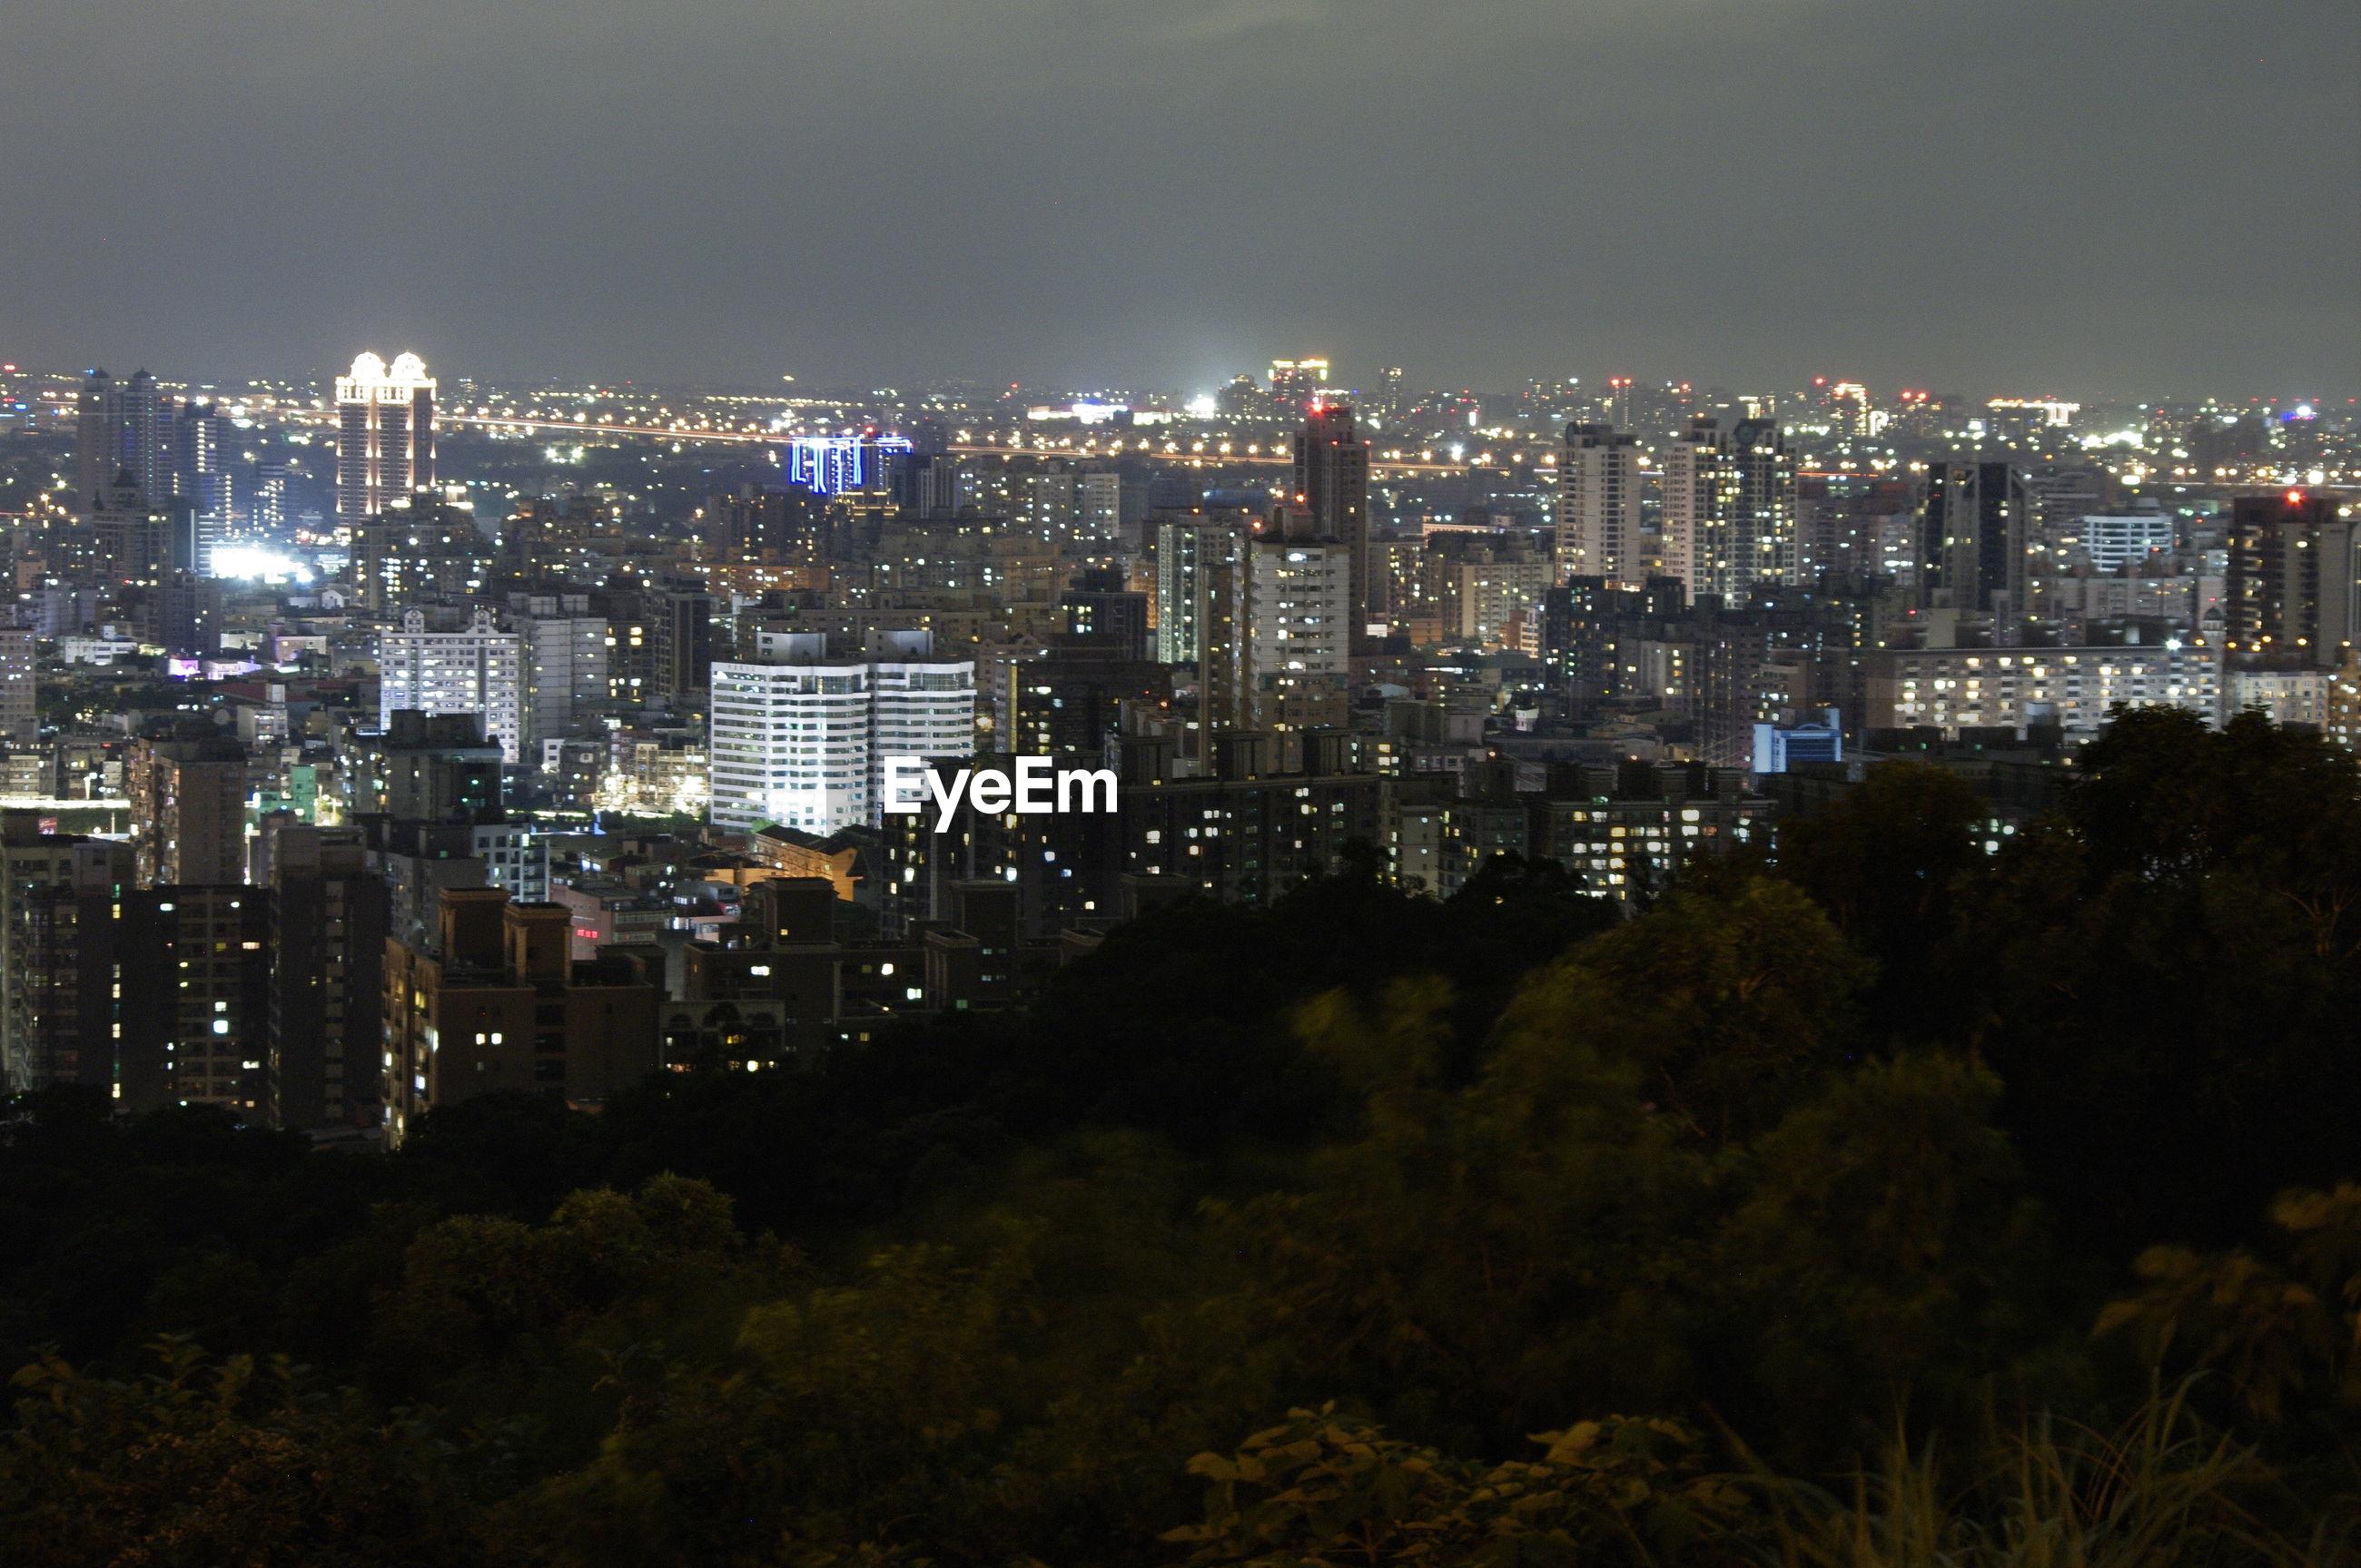 ILLUMINATED CITY BUILDINGS AGAINST SKY AT NIGHT